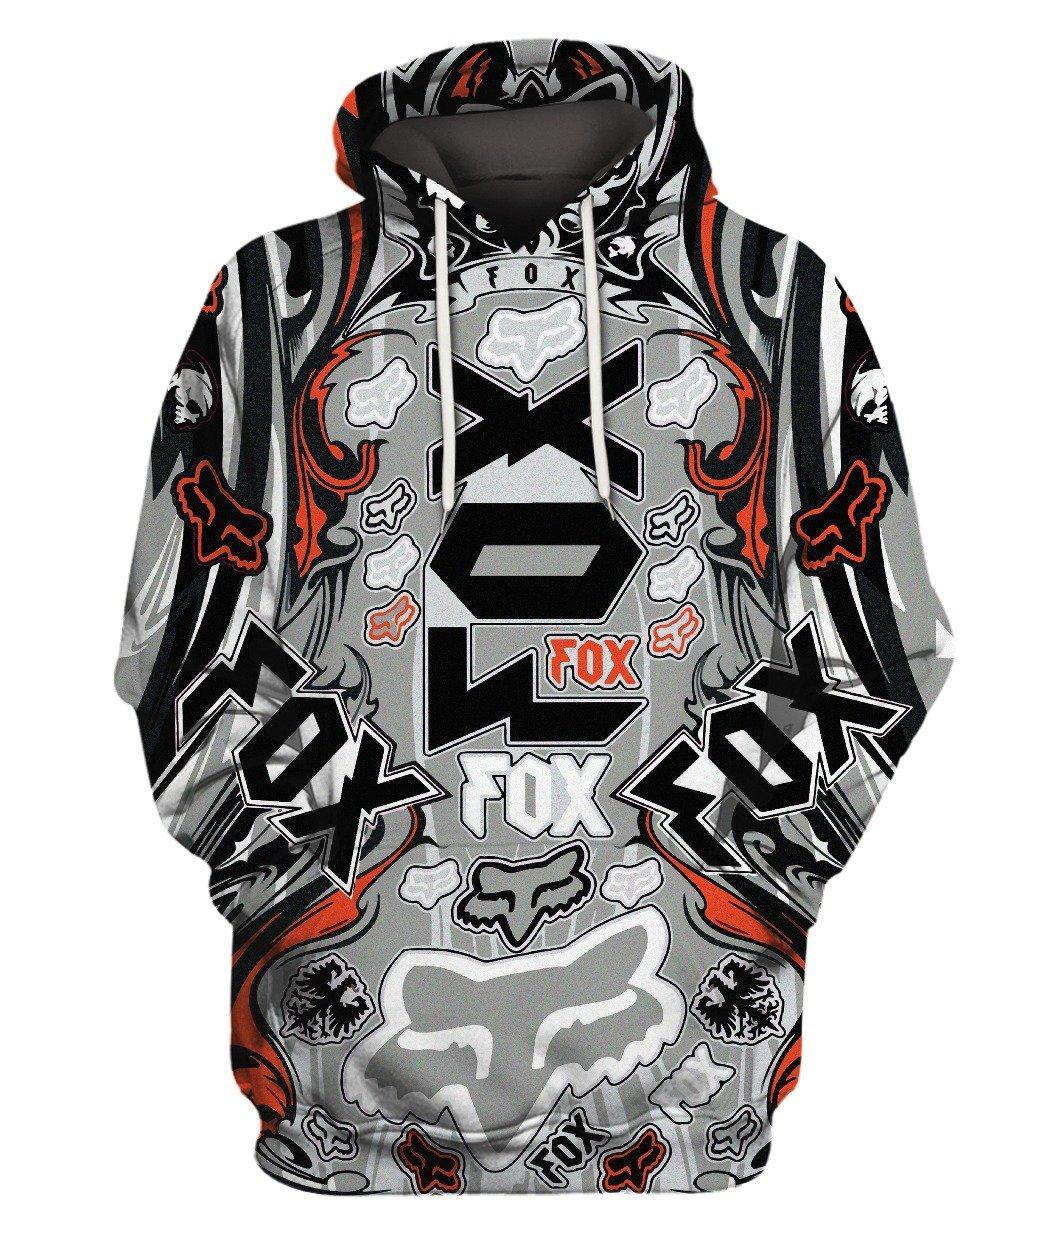 Fox Bike Grey 3d Full Print 3d Graphic Printed Tshirt Hoodie Up To 5xl